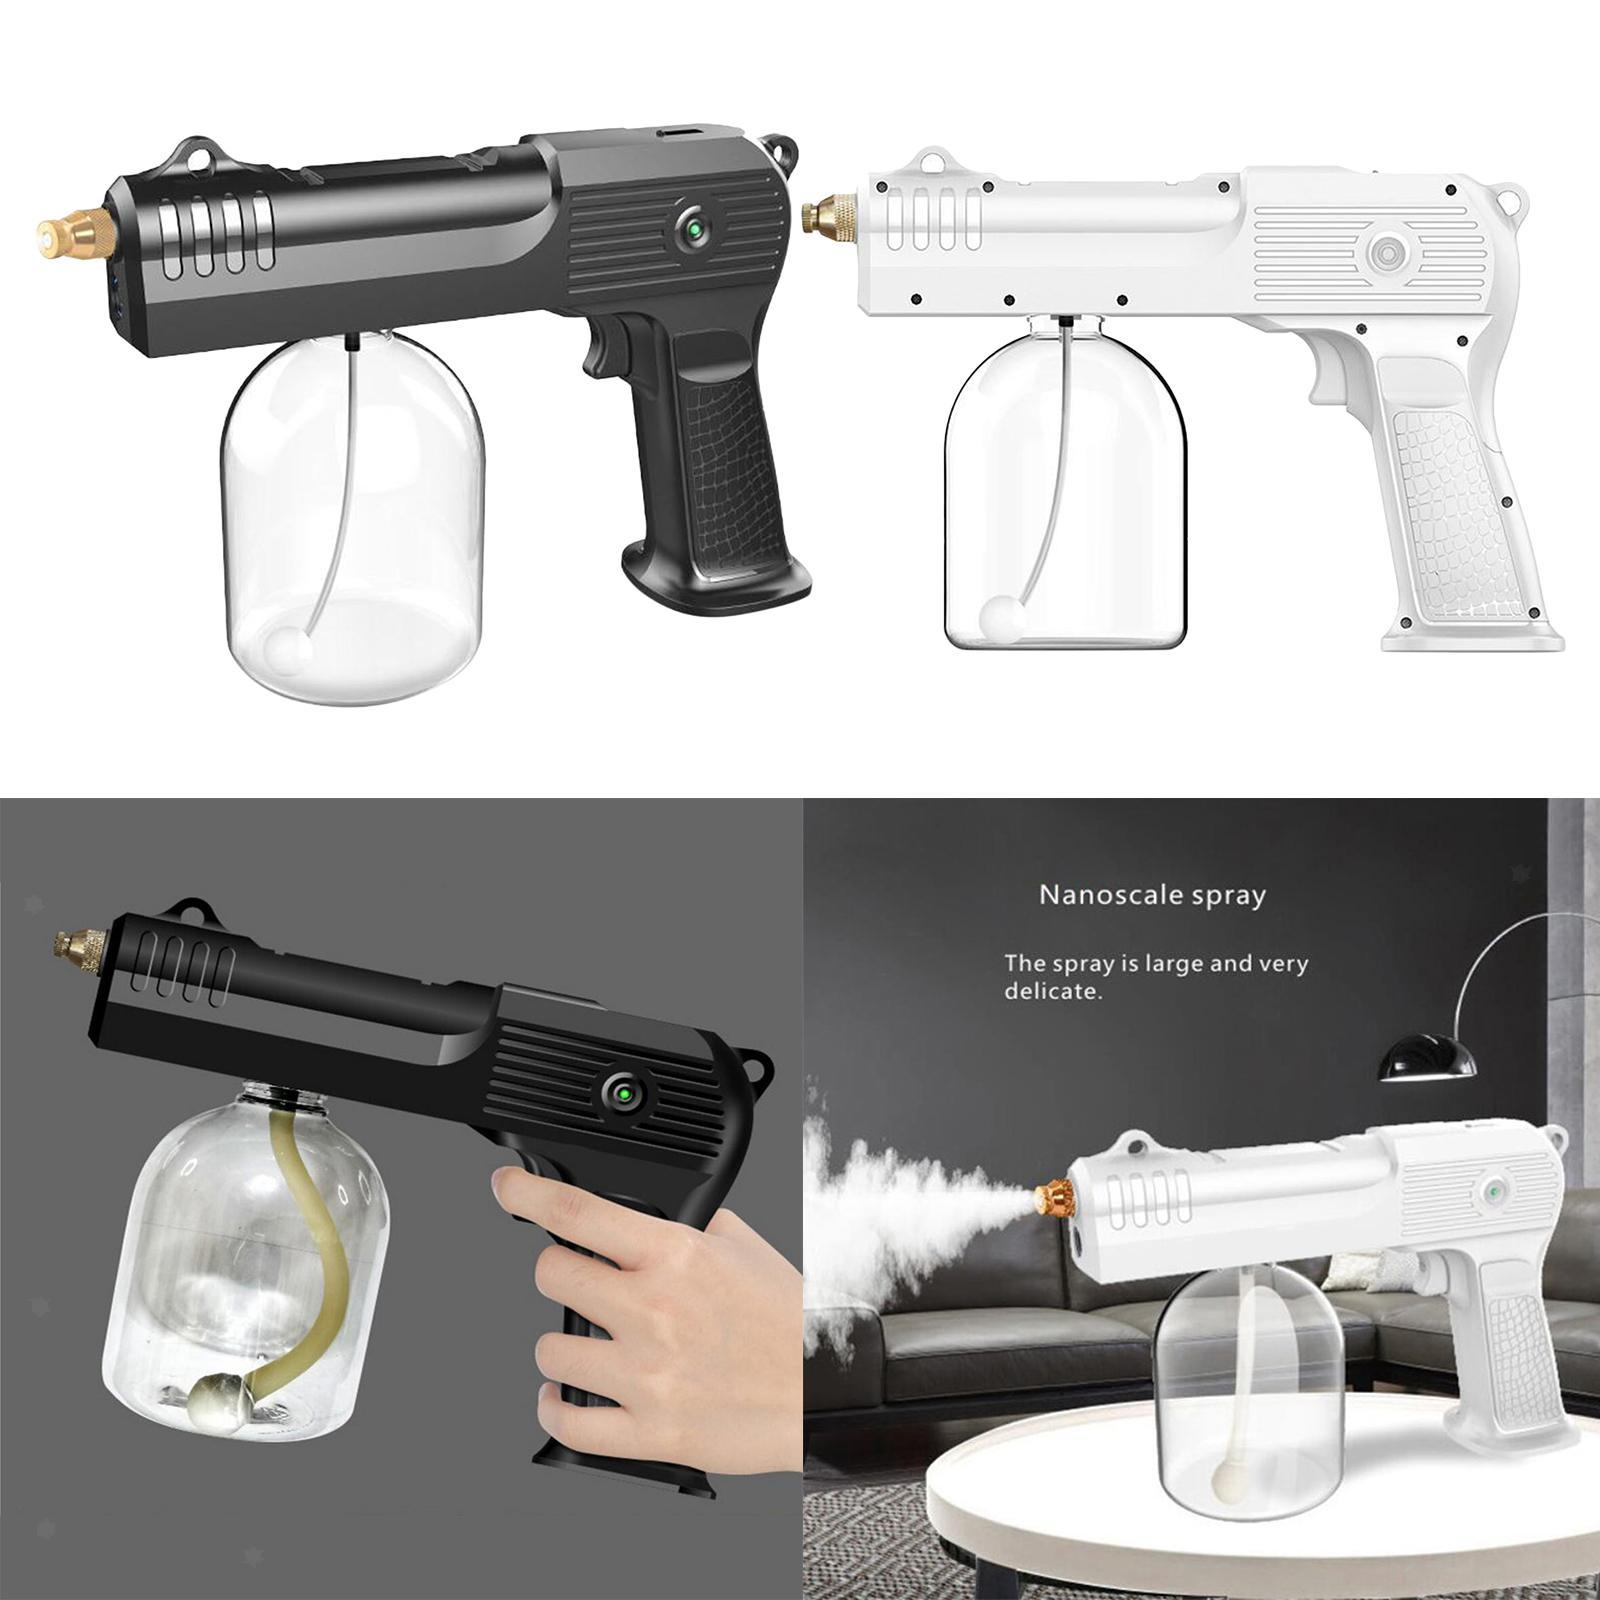 thumbnail 2 - 2x Cordless USB Nano Sanitizer Sprayer Disinfectant Fogger 500ml Spray Gun